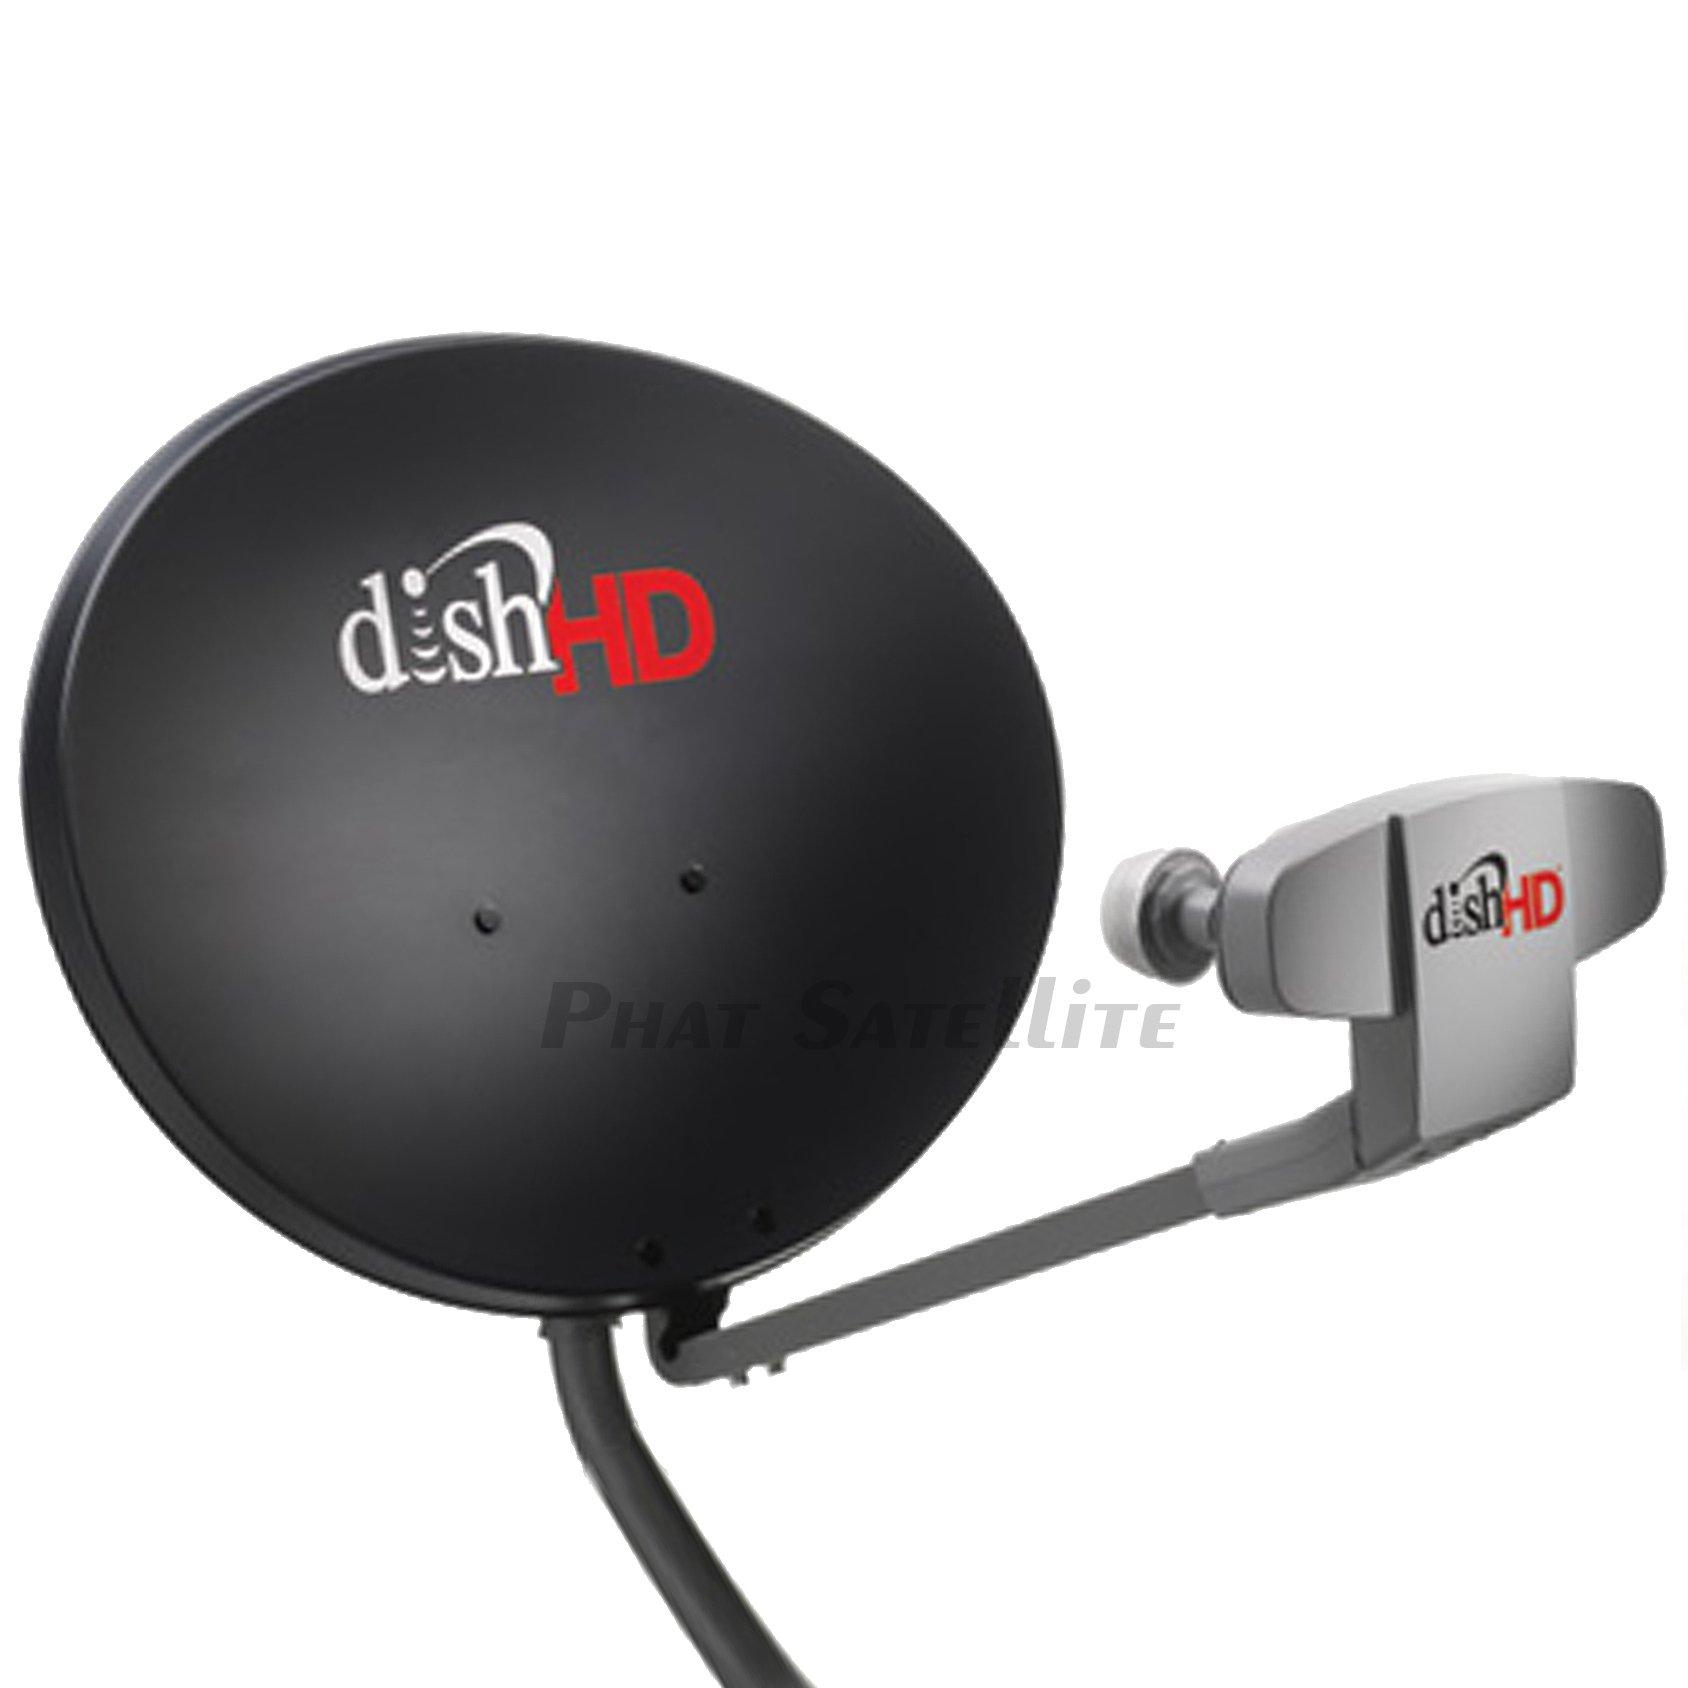 Amazon.com: Dish Network 1000.2 Dish 110, 119, 129 Satellites High  Definition Dish: Home Audio & Theater